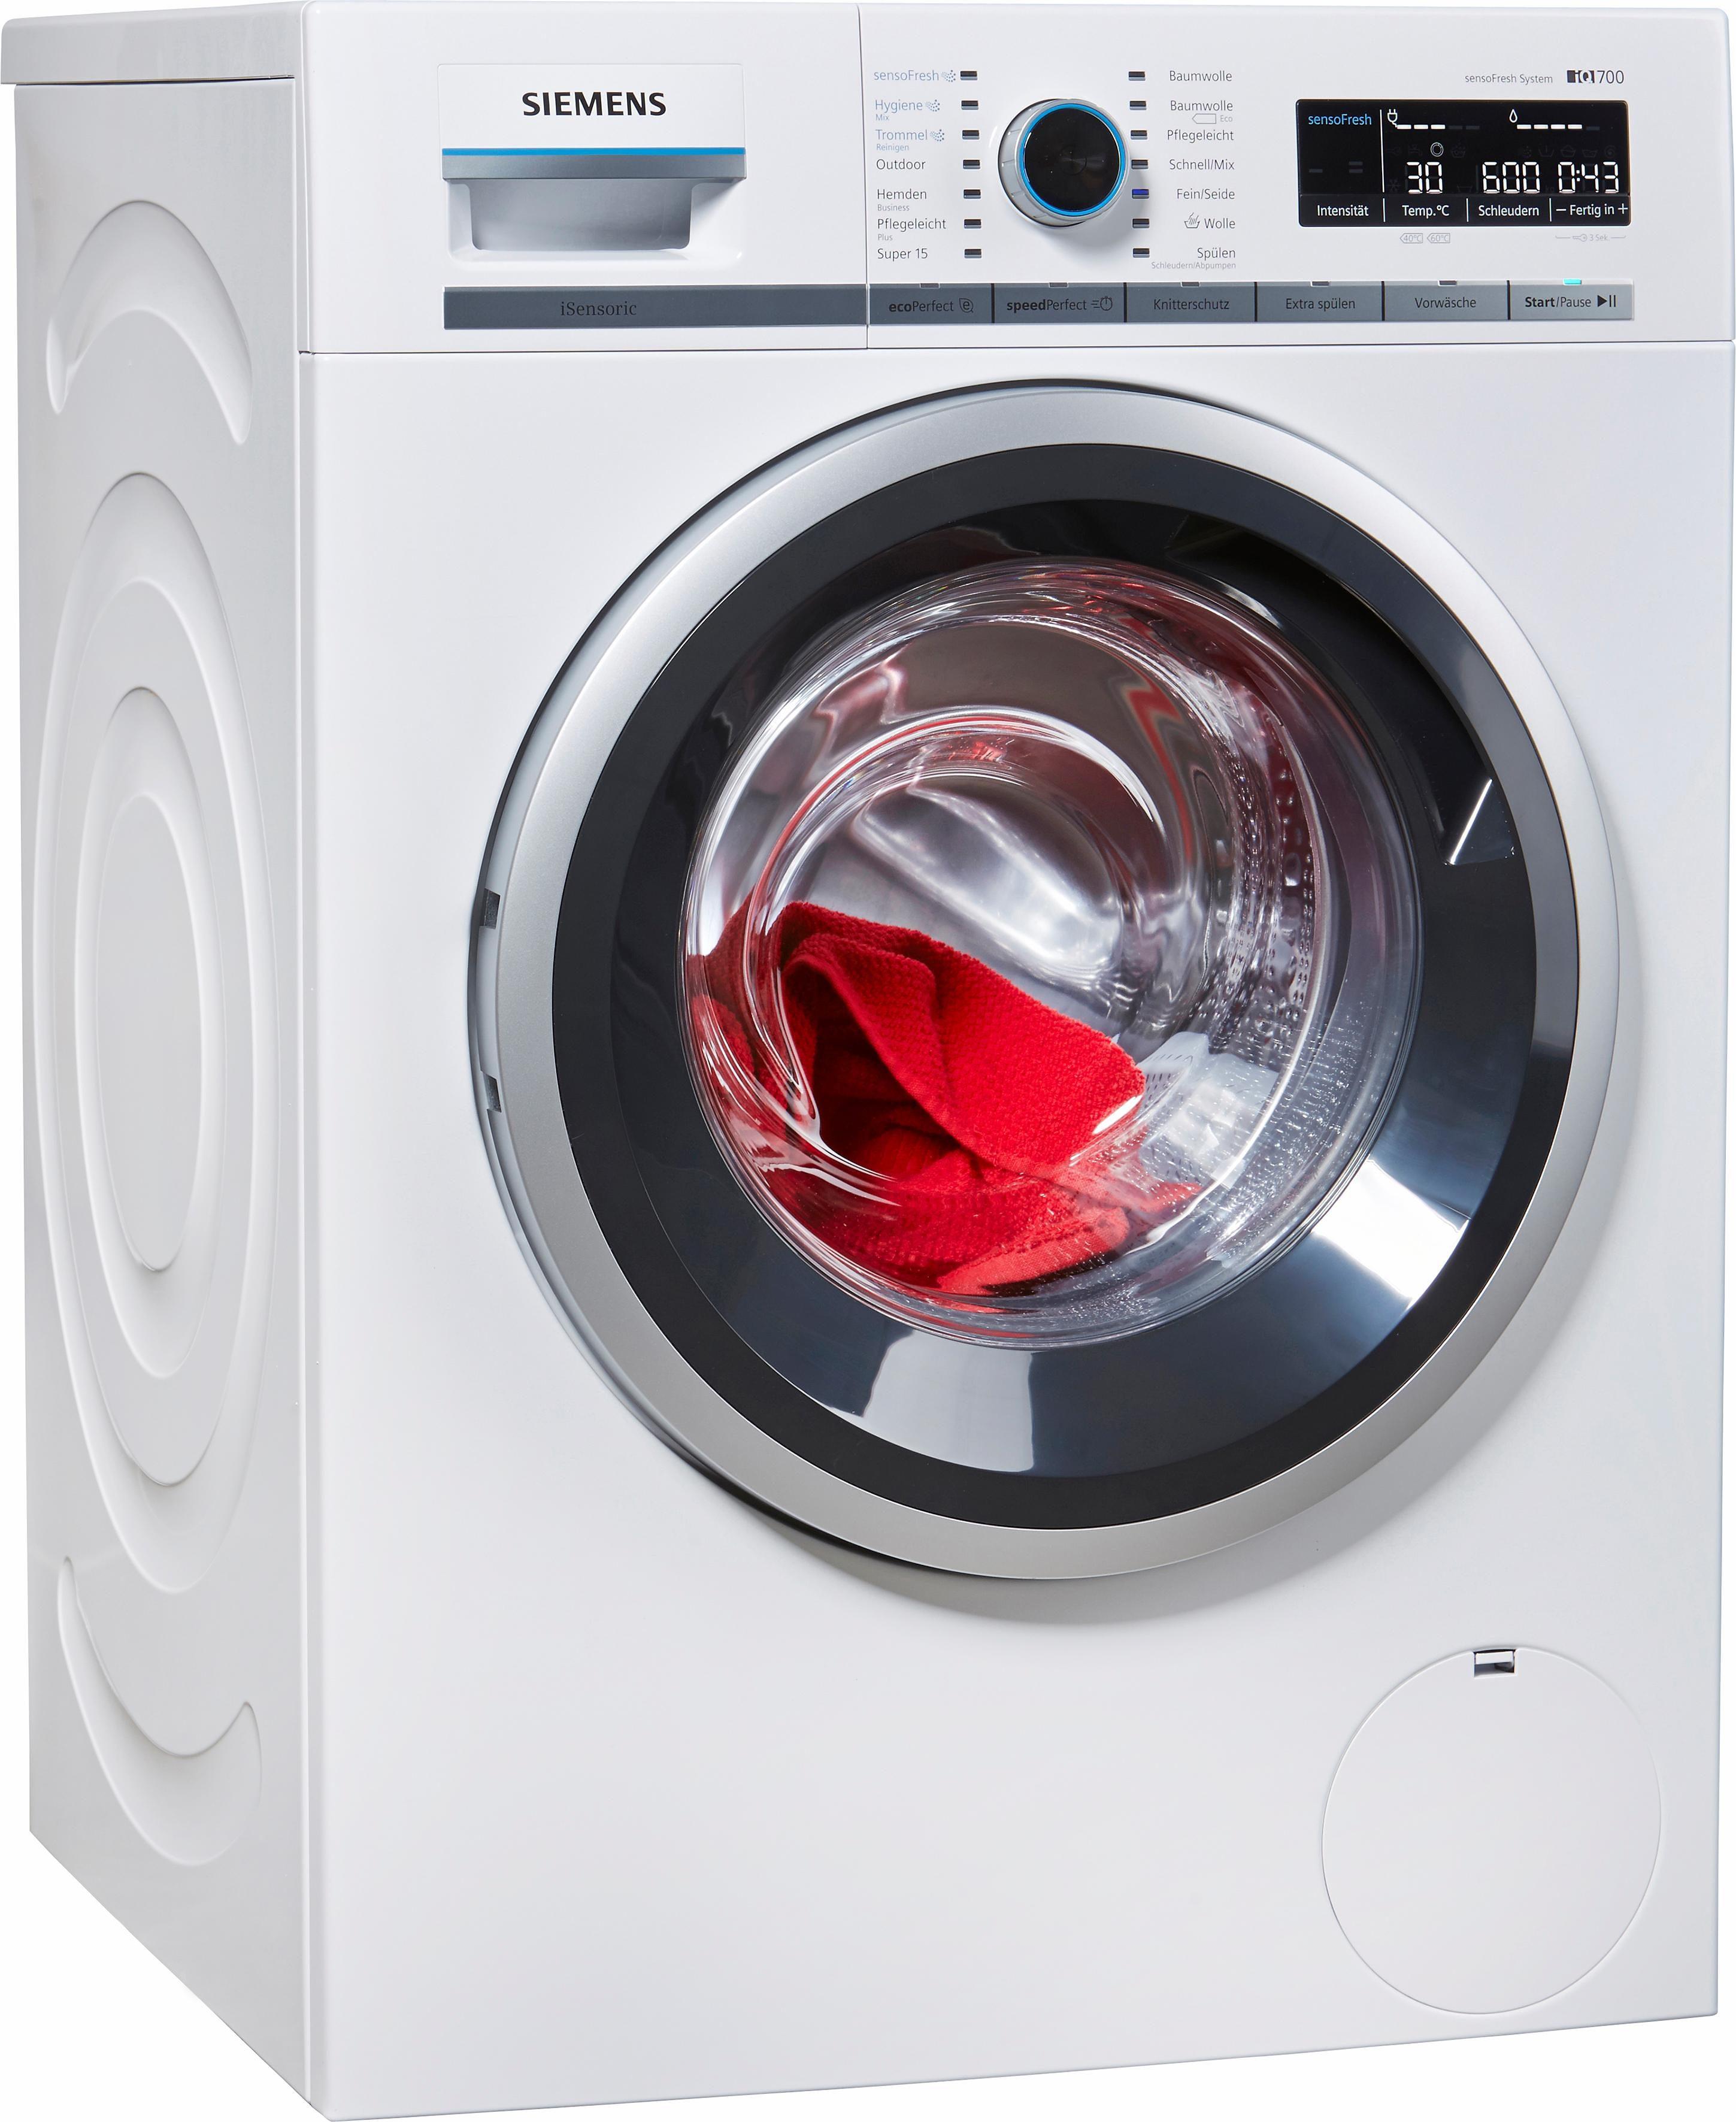 SIEMENS Waschmaschine WM14W740, A+++, 8 kg, 1400 U/Min